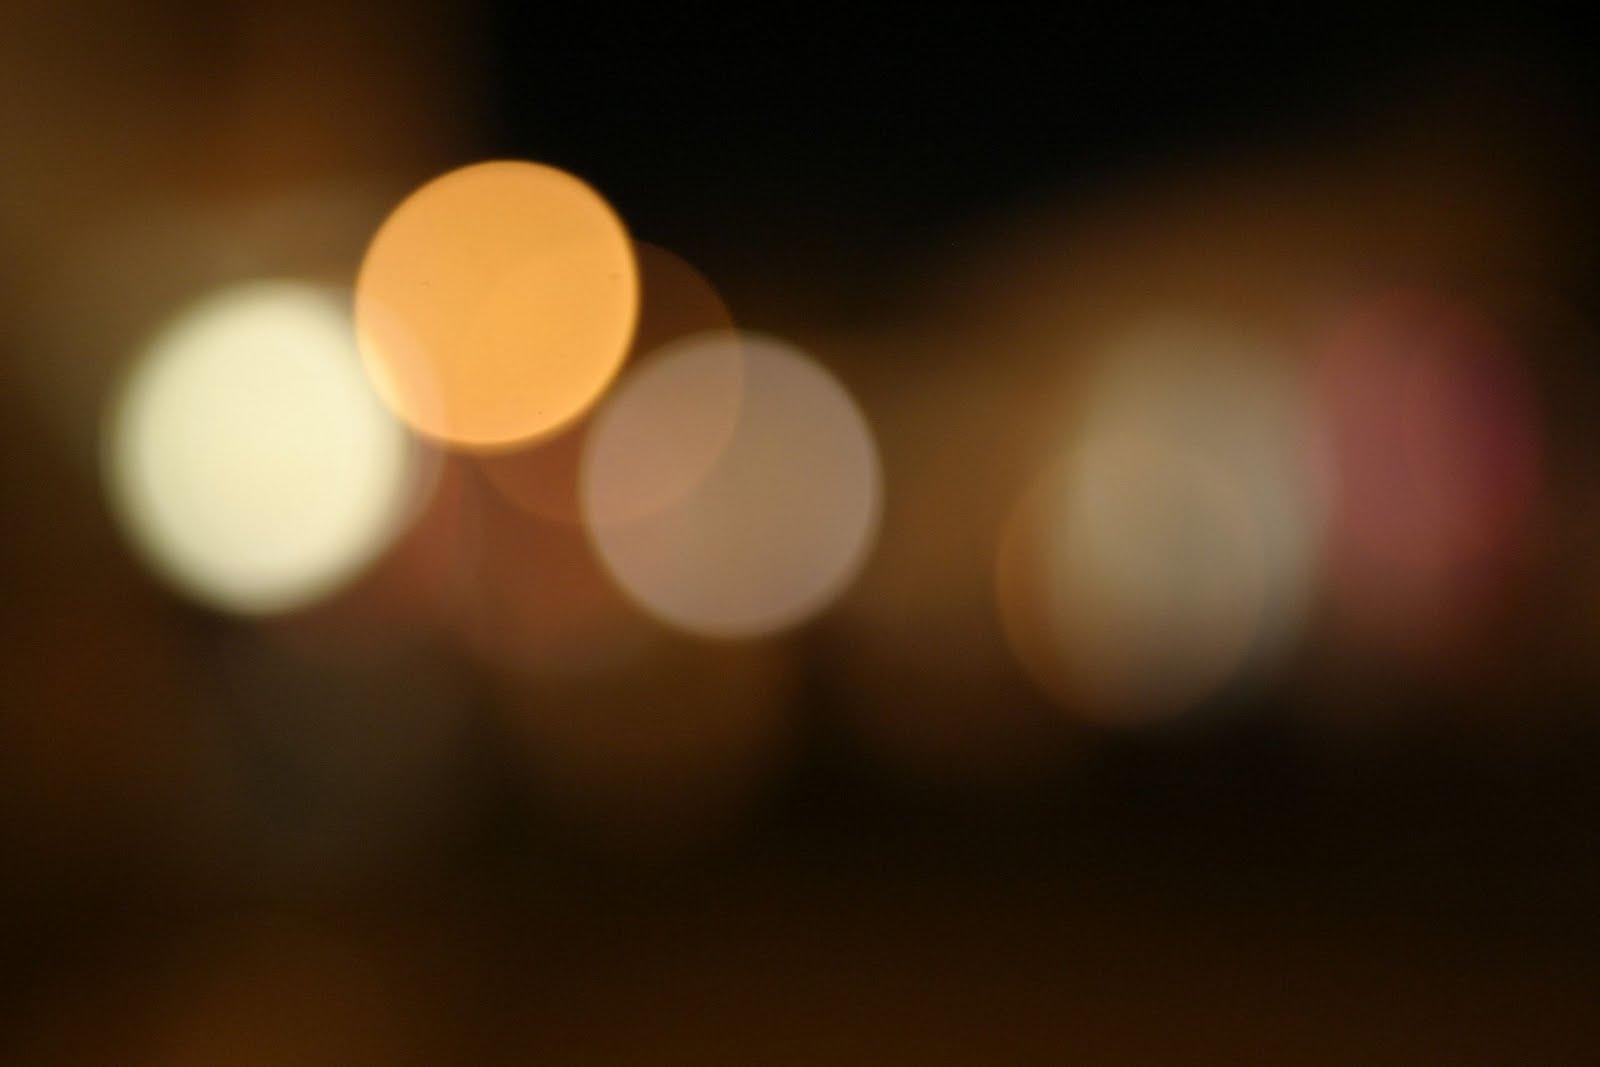 http://3.bp.blogspot.com/-QibH4o-GseU/TkakvPKXlWI/AAAAAAAAAGM/HHXhmqQftw8/s1600/ubuntu+%252816%2529.jpg